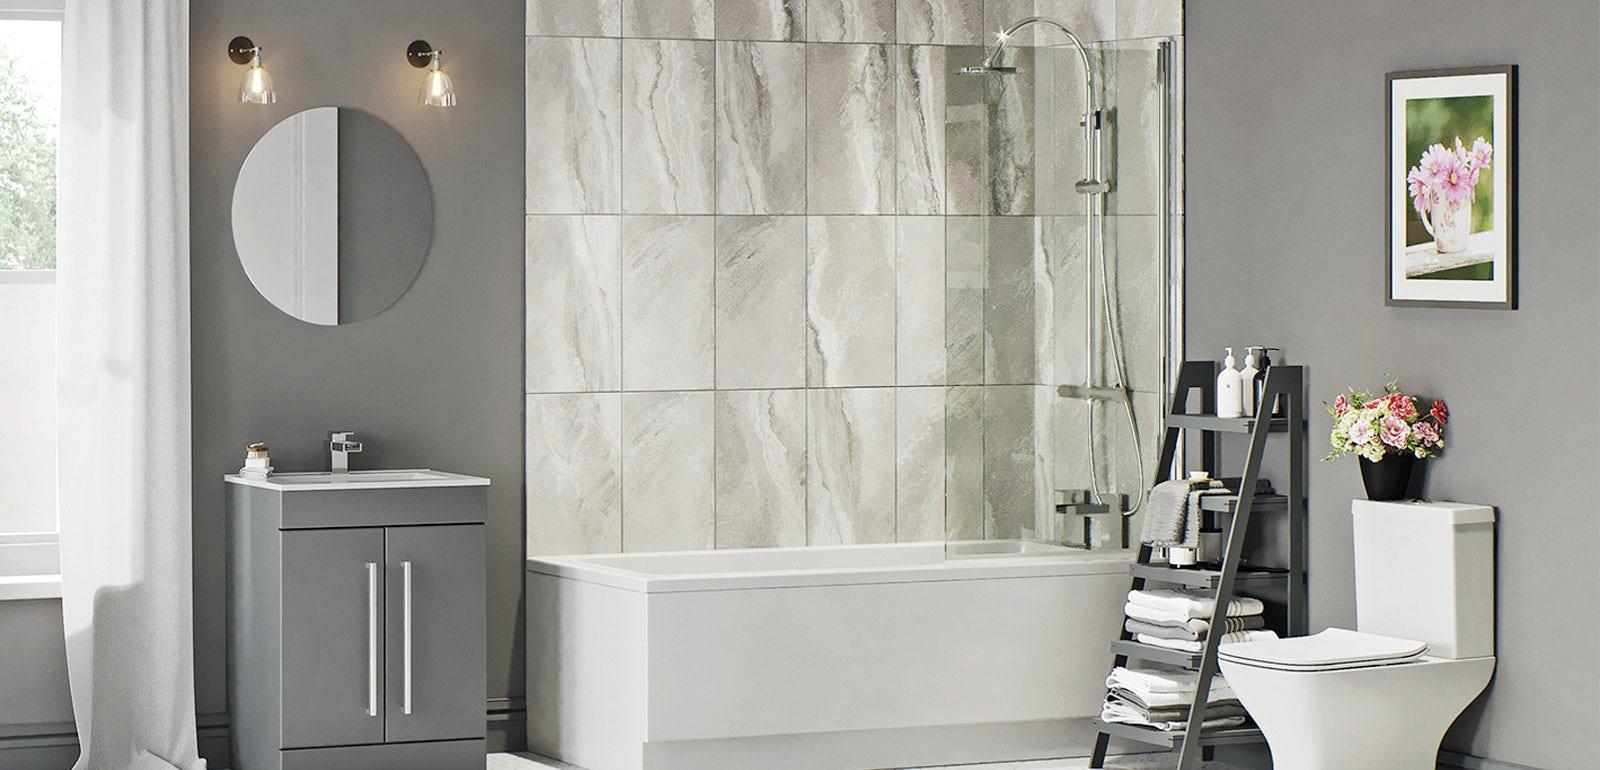 Shower baths buying guide   VictoriaPlum.com